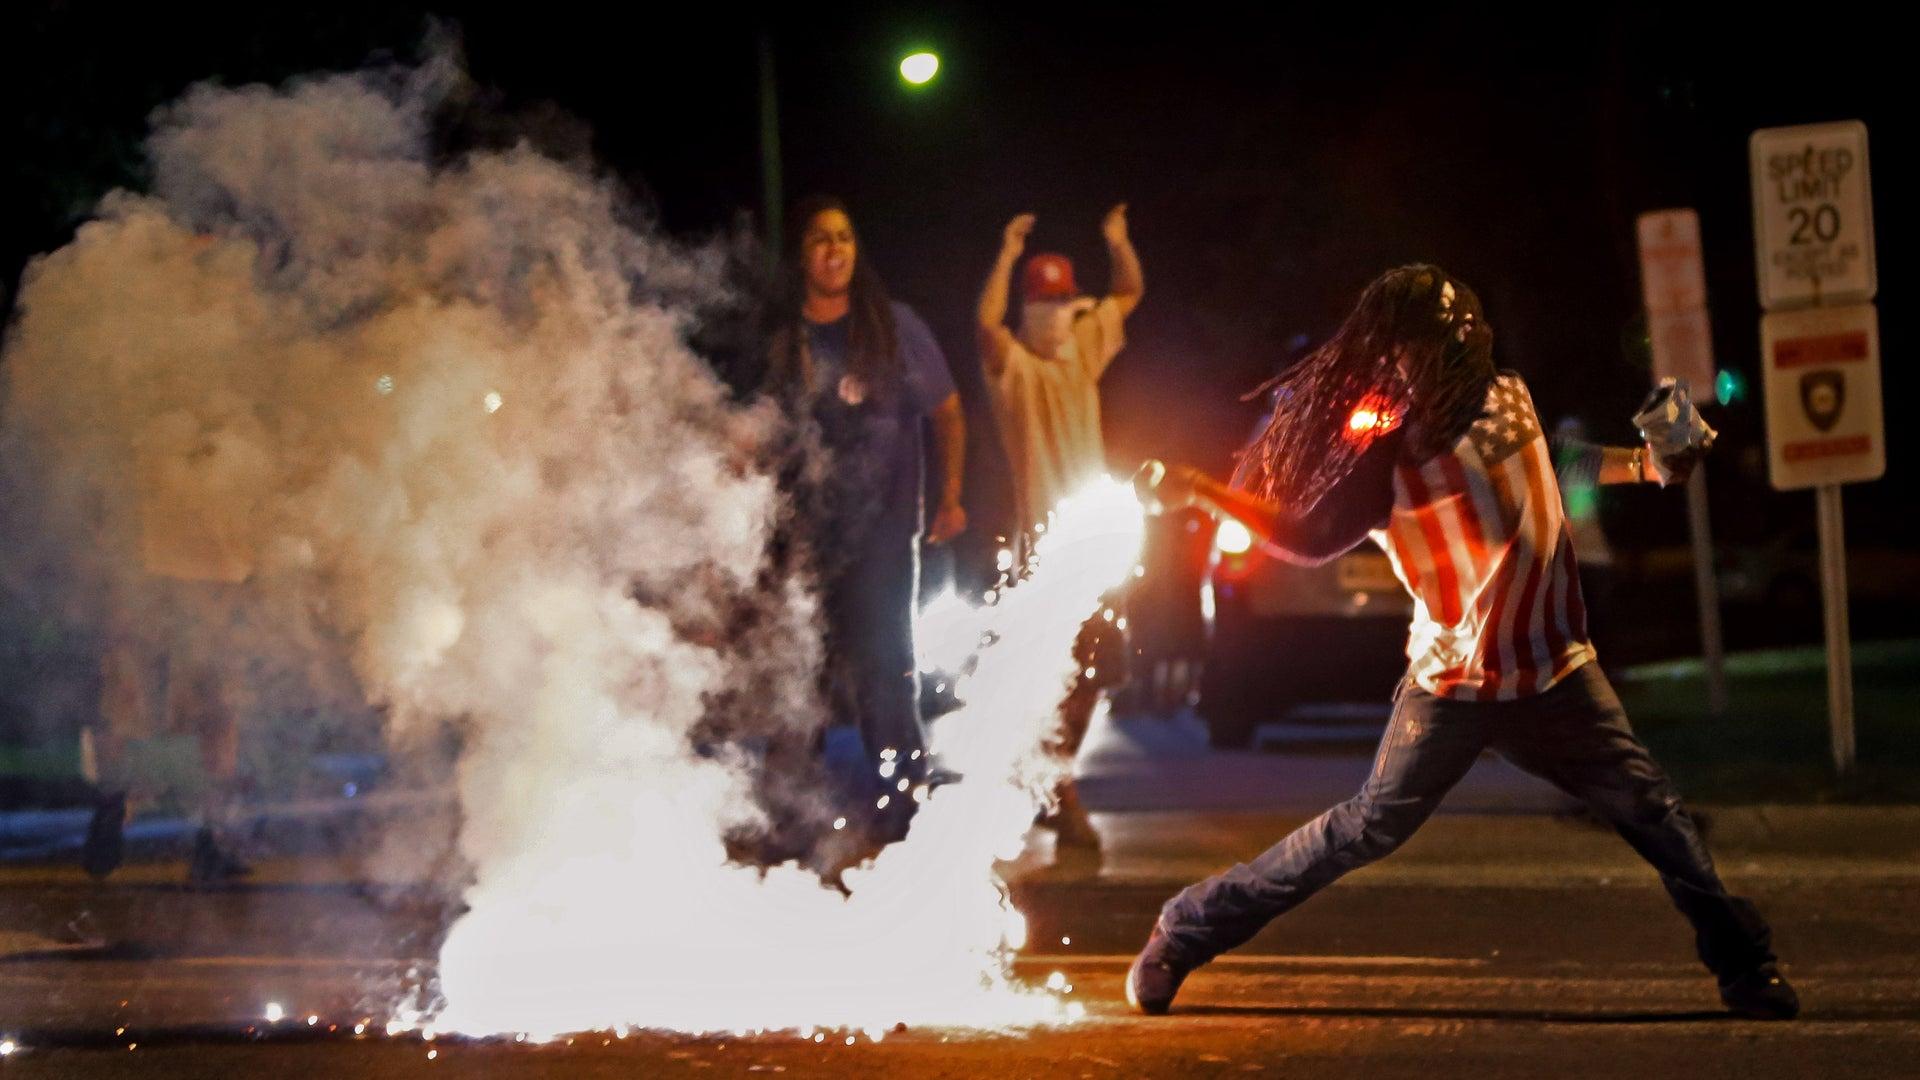 Edward Crawford, Ferguson Activist In Iconic Protest Photo, Found Dead